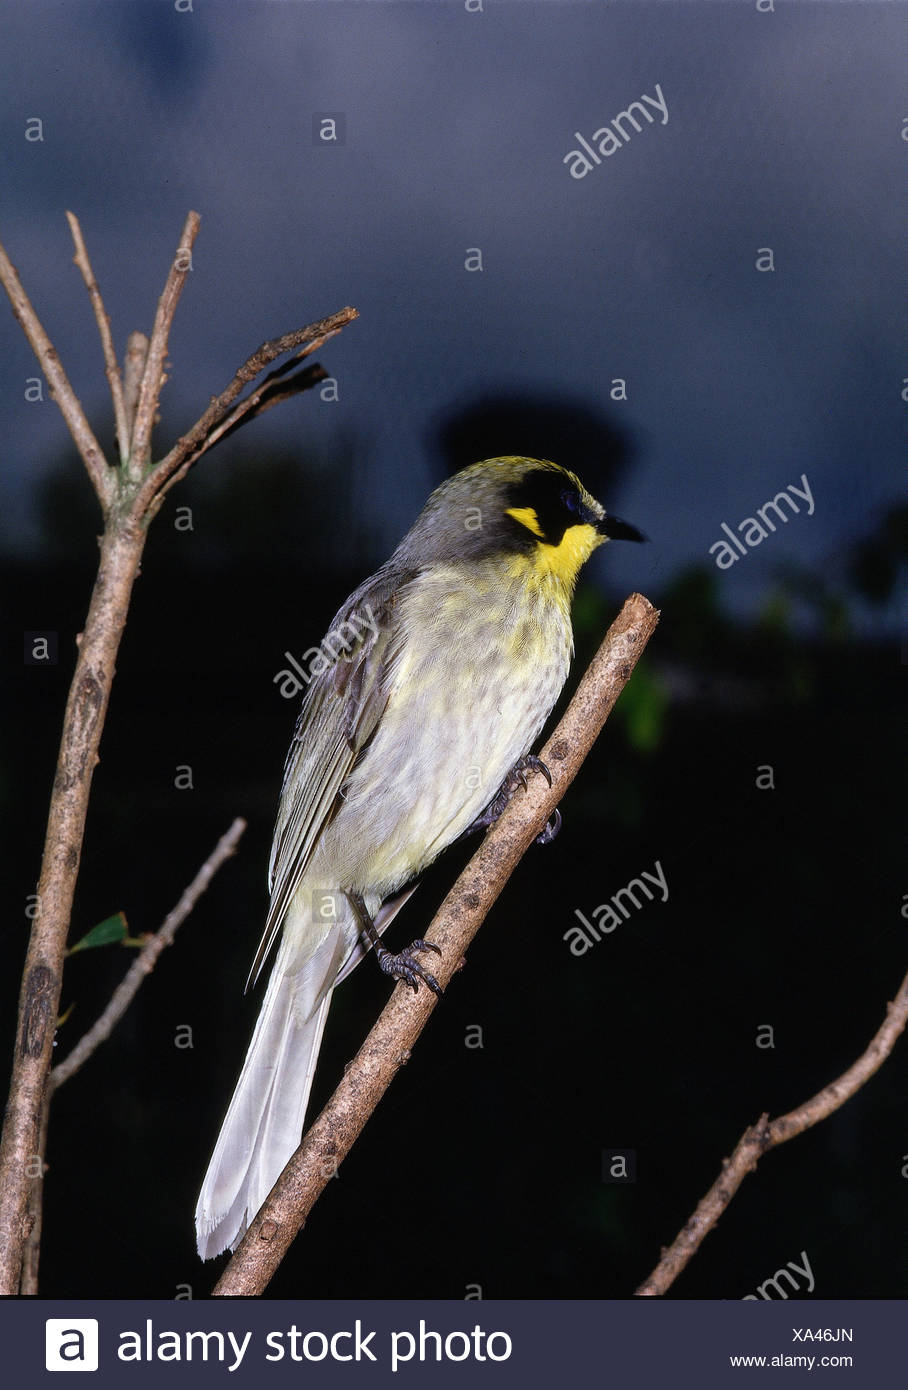 zoology / animals, avian / birds, Yellow-tufted Honeyeater, (Lichenostomus melanops), sitting on branch, distribution: Australia - Stock Image